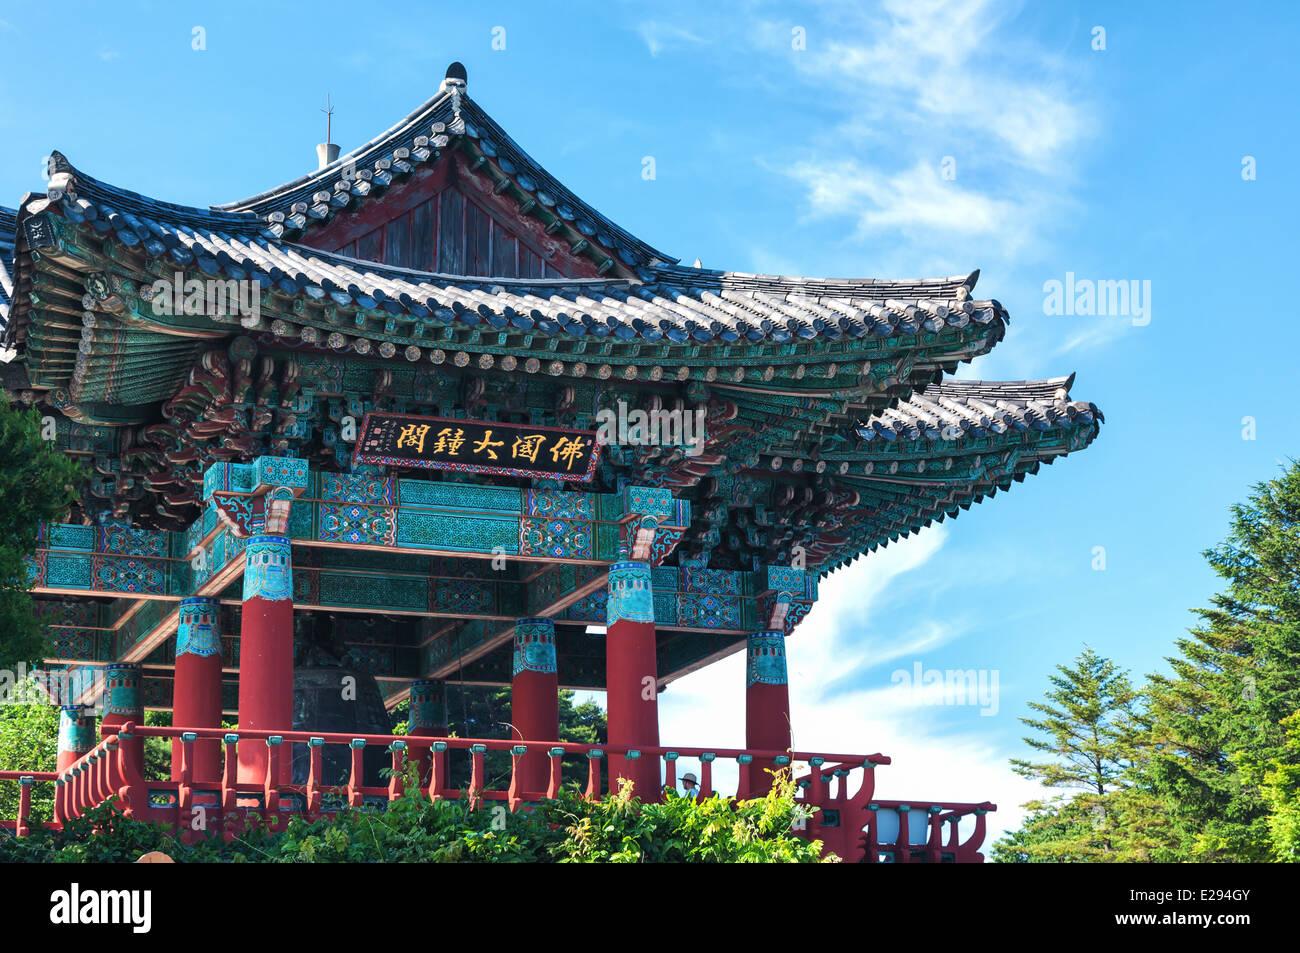 Traditional Korean Architecture At Seokguram Grotto In Gyeongju South Korea